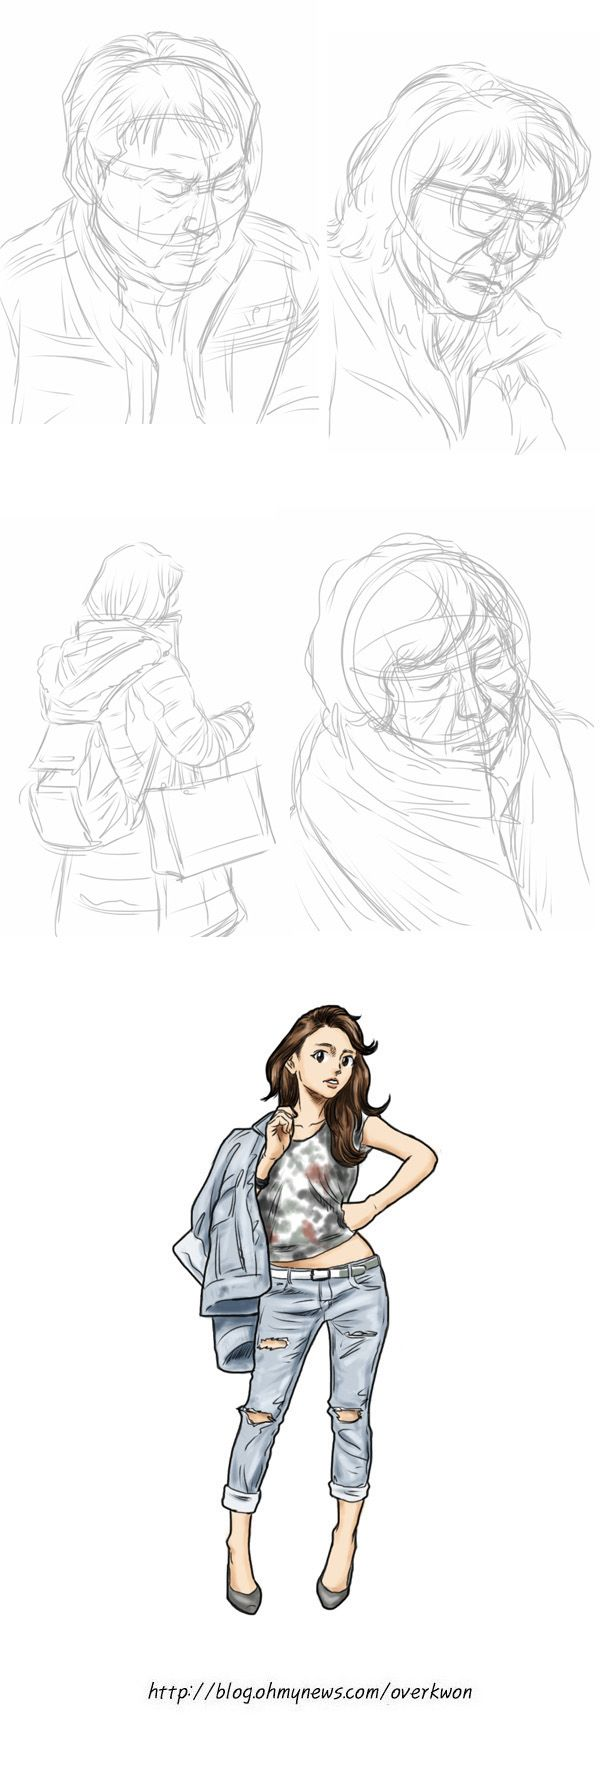 http://blog.ohmynews.com/overkwon/537791   iPad sketch 오버권 아이패드 스케치